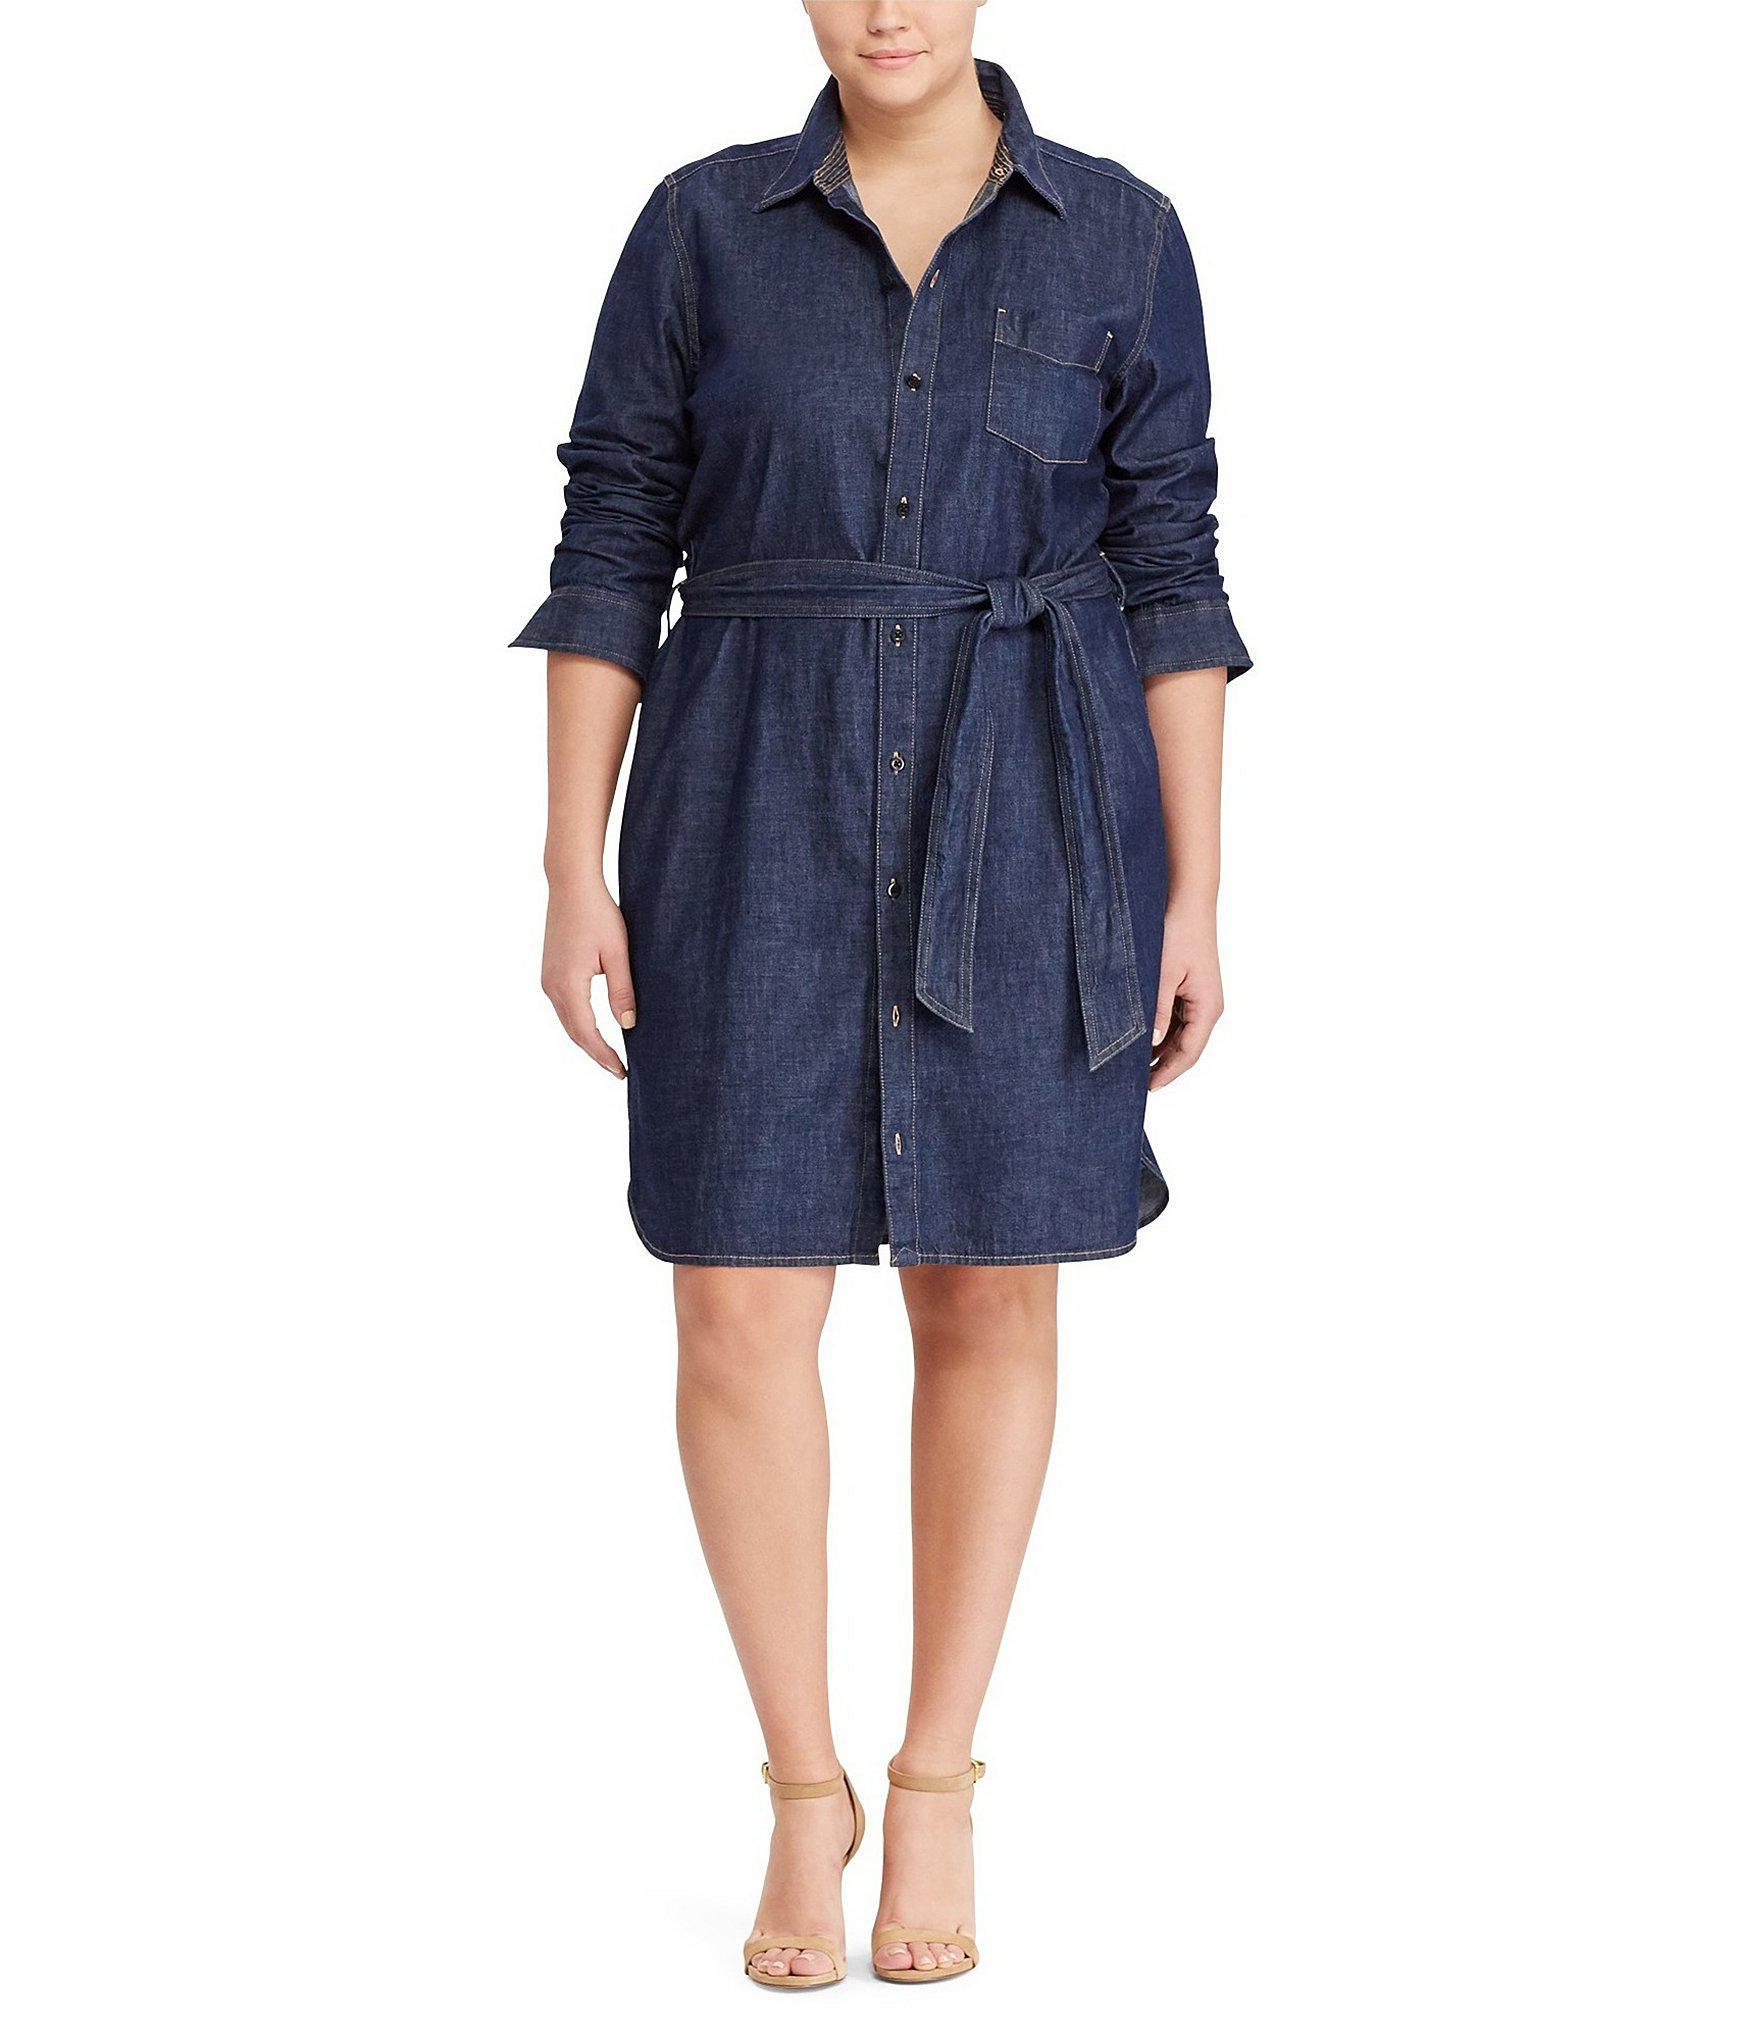 cba75fe0951 Lyst - Lauren By Ralph Lauren Plus Denim Shirt Dress in Blue